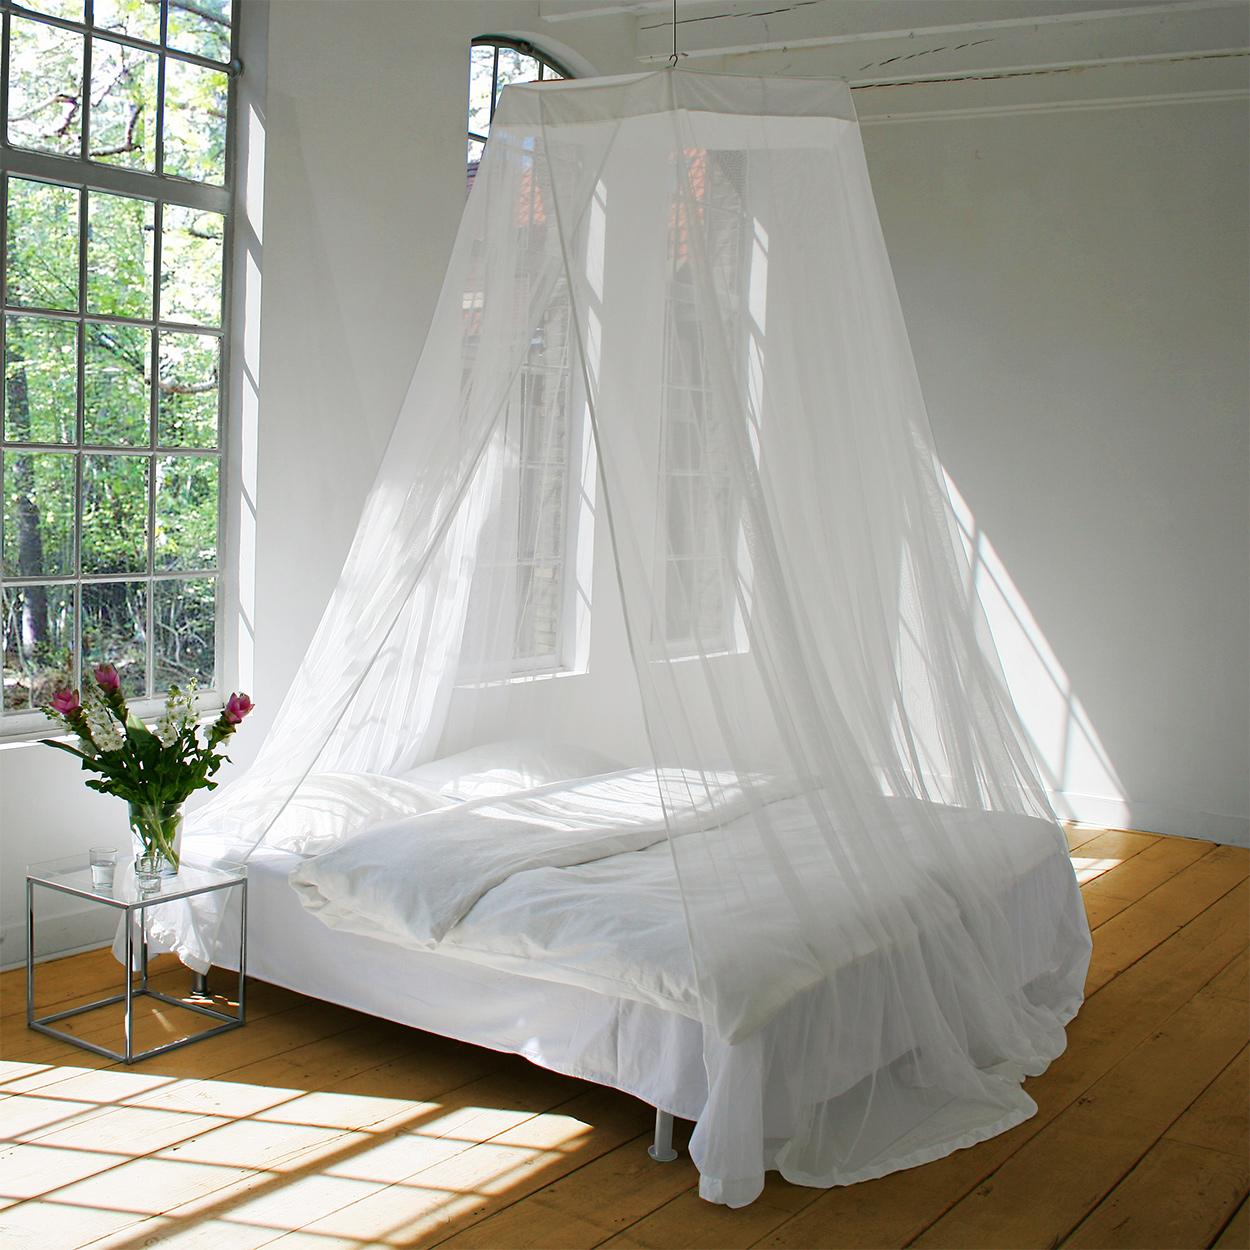 insektnet til seng Runde moskitonet insektnet til seng